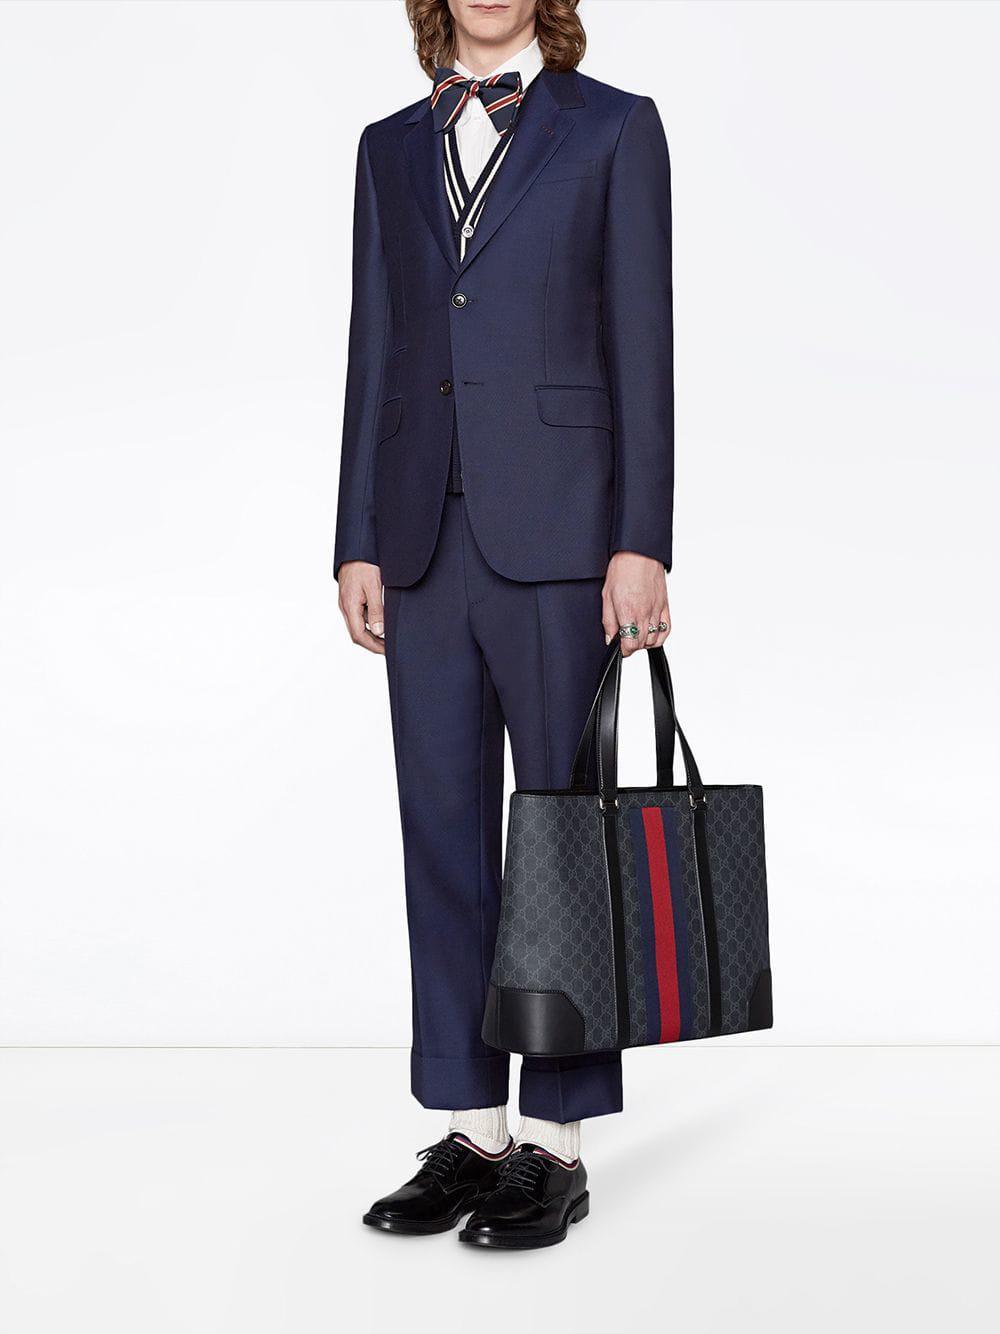 Gucci - Black GG Supreme Tote for Men - Lyst. View fullscreen fed72c986f8c7